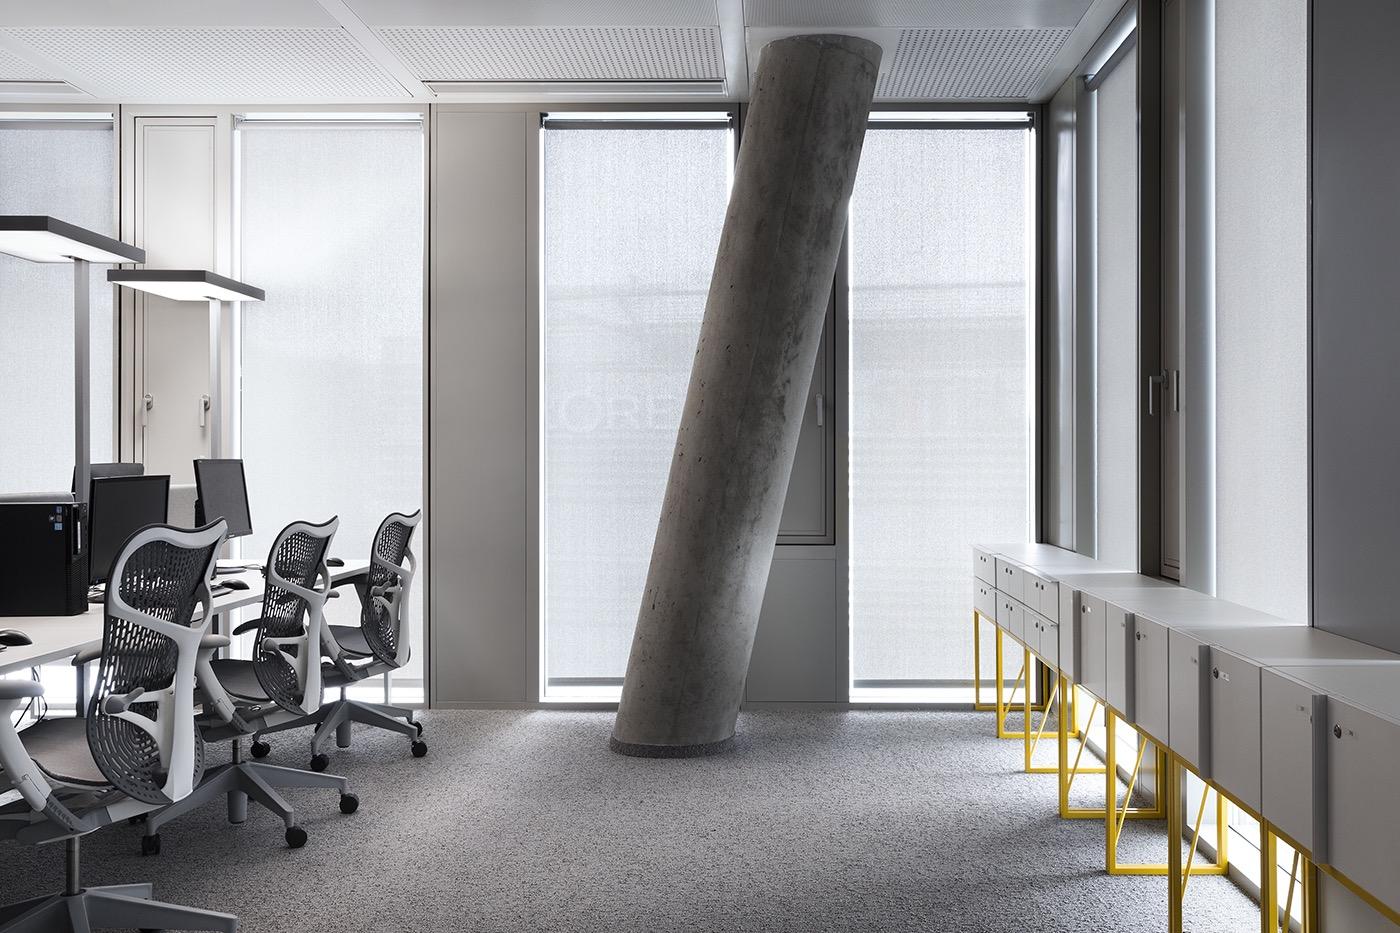 gvc-sofia-office-11